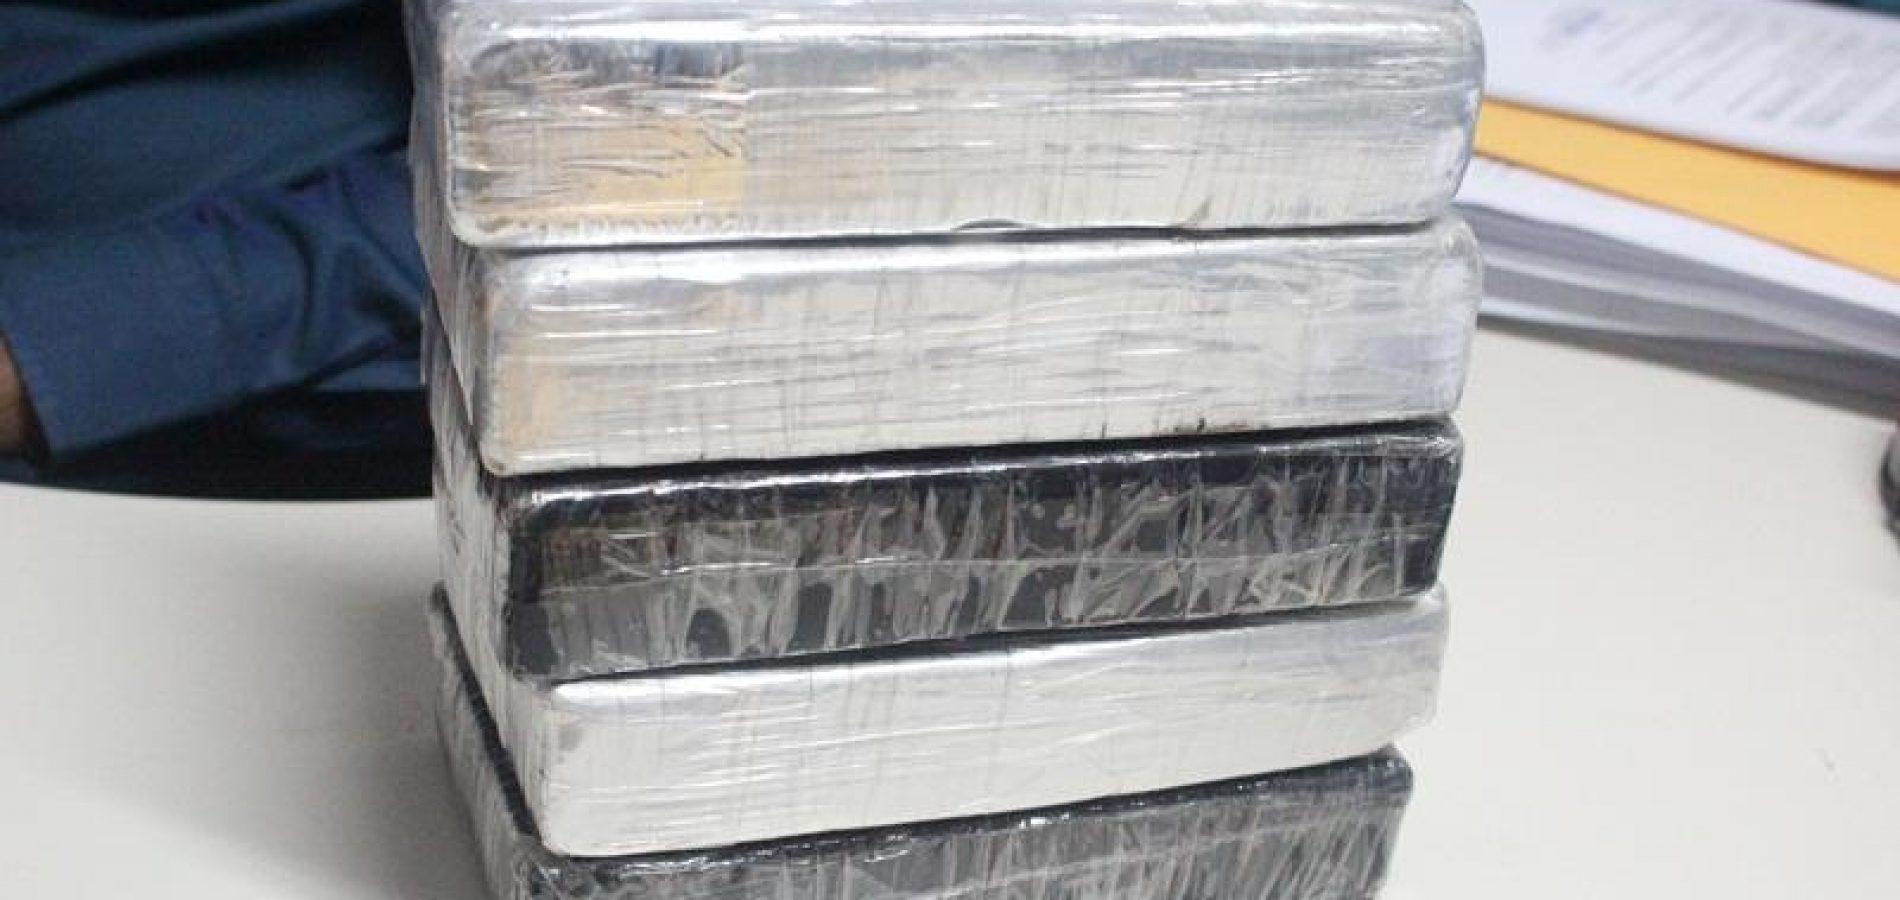 Polícia apreende cocaína avaliada em R$ 450 mil na rodoviária de Picos